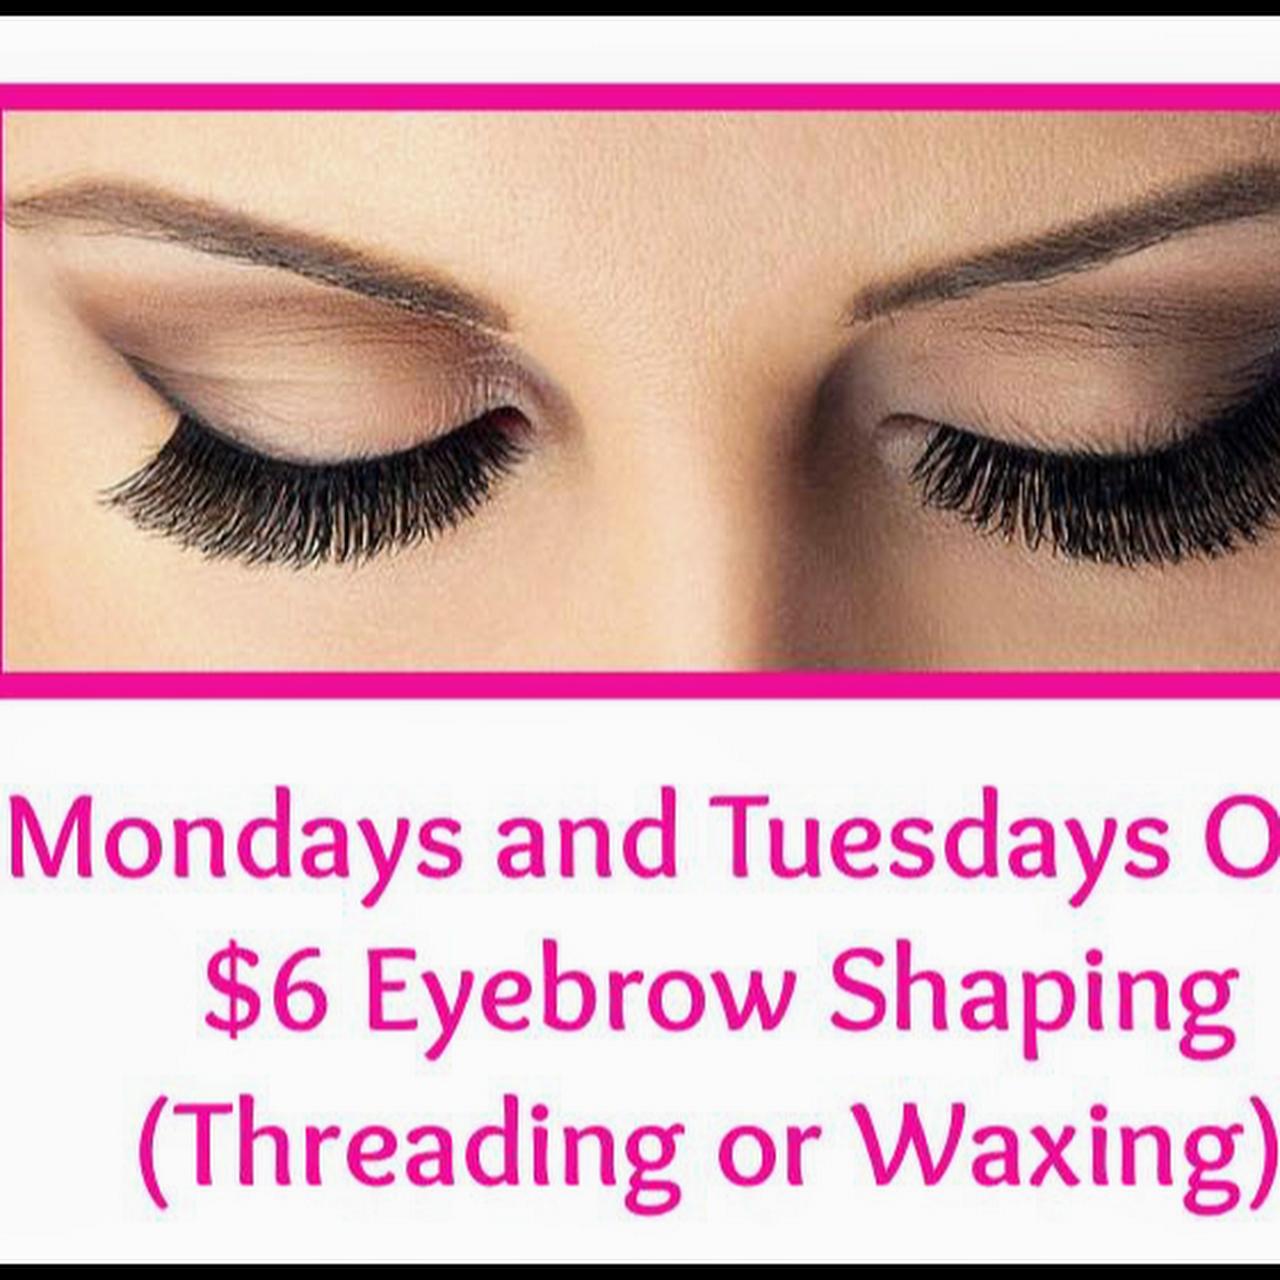 Blink Eyebrows - Threading & Waxing Salon - Beauty Salon in